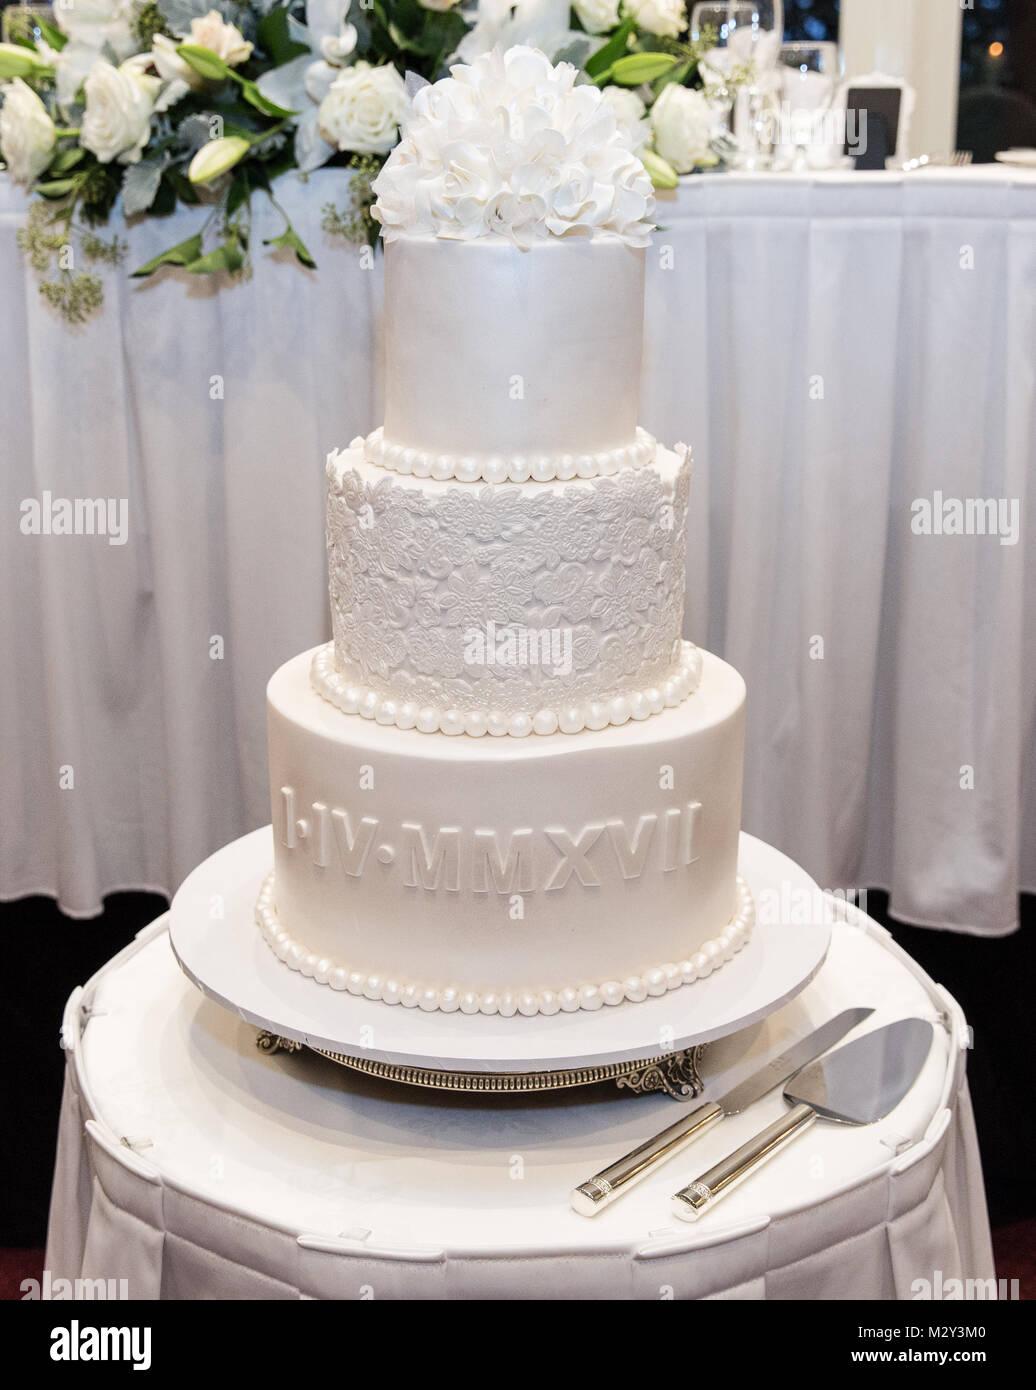 Traditional tiered wedding cake - Stock Image